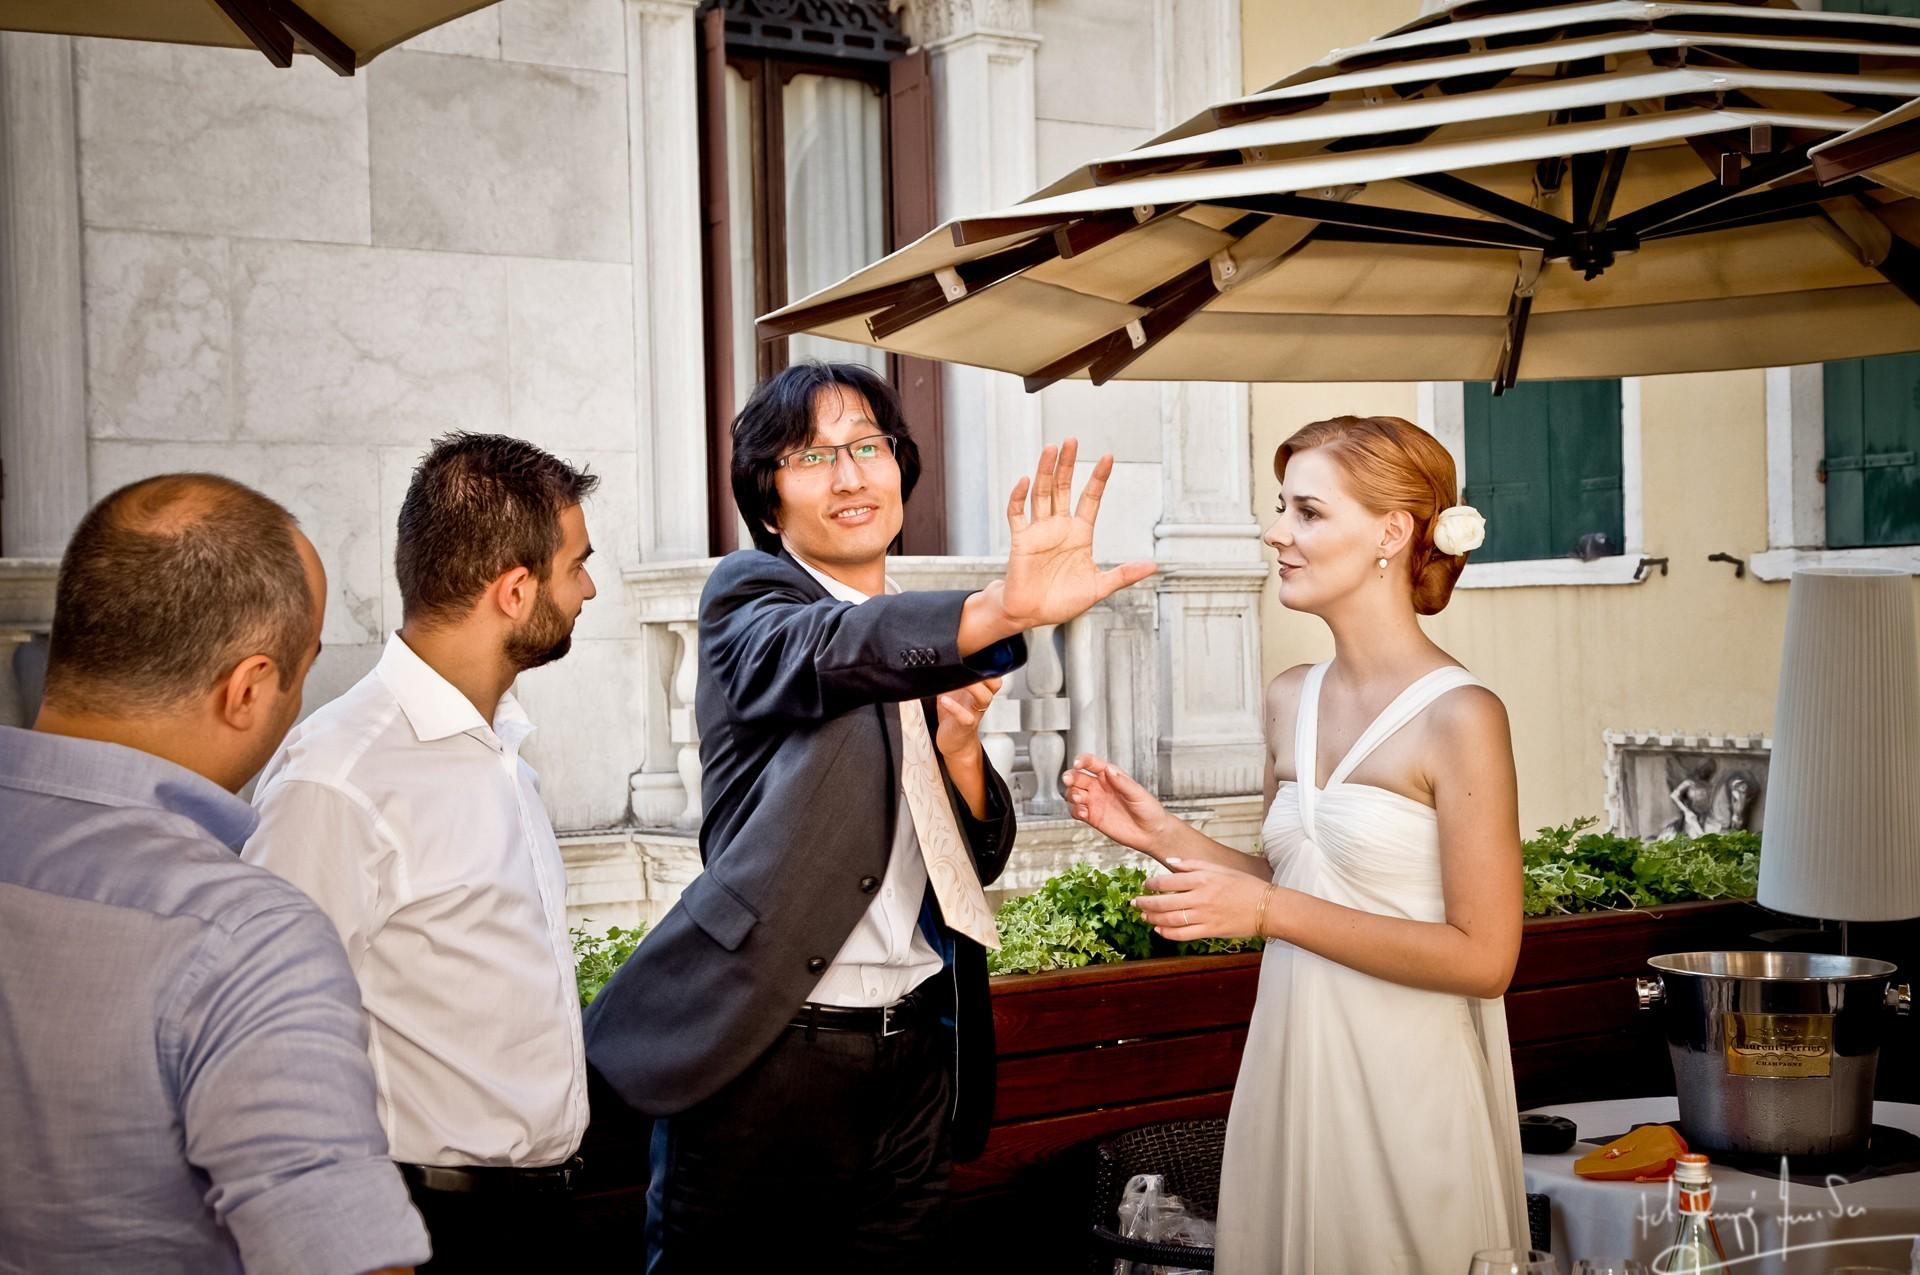 Ślub w wenecji 67 Manuela Luiza & Young Seon Song